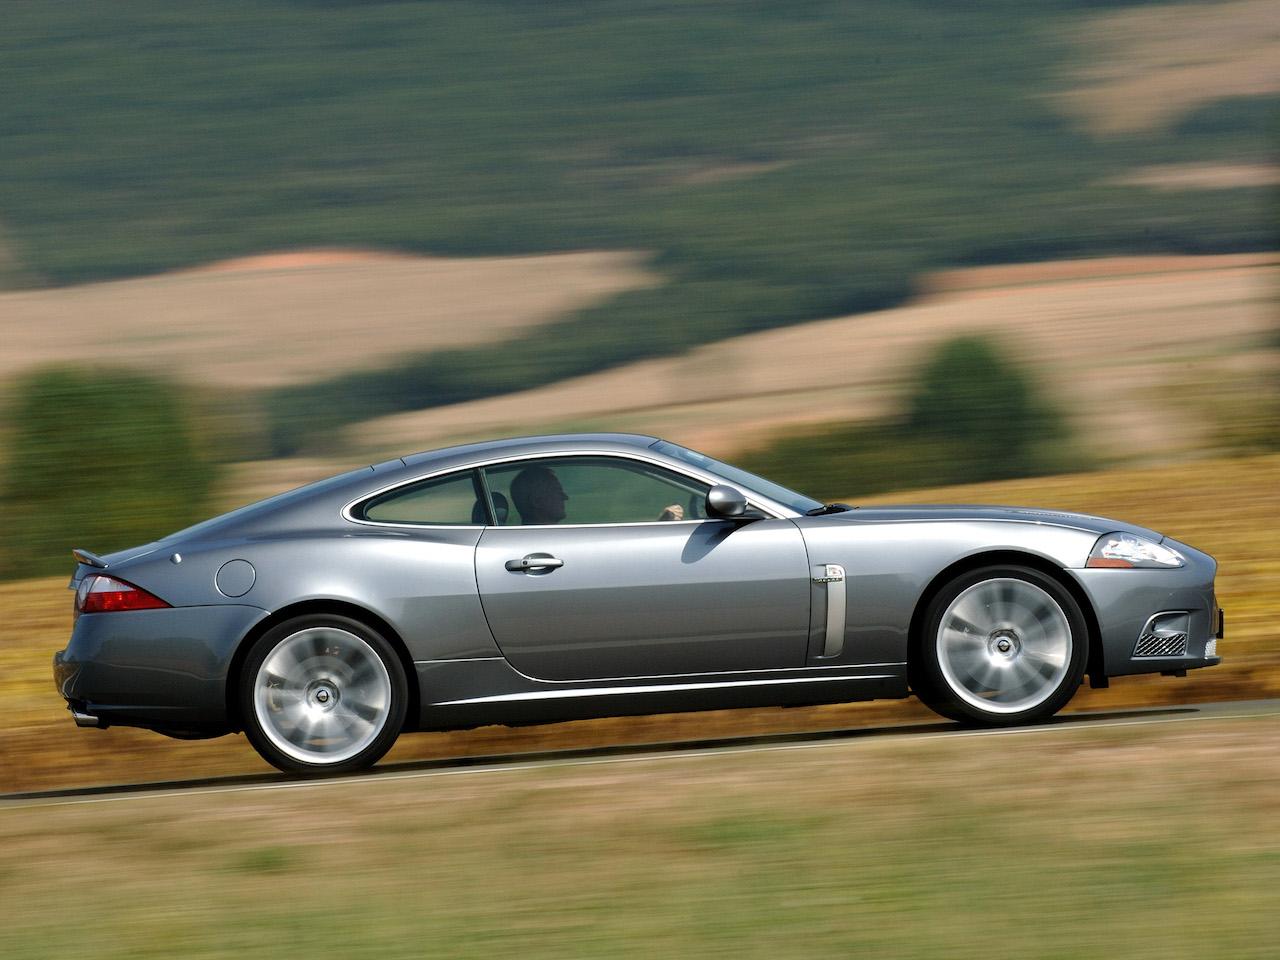 2021 Jaguar Xj Coupe Research New